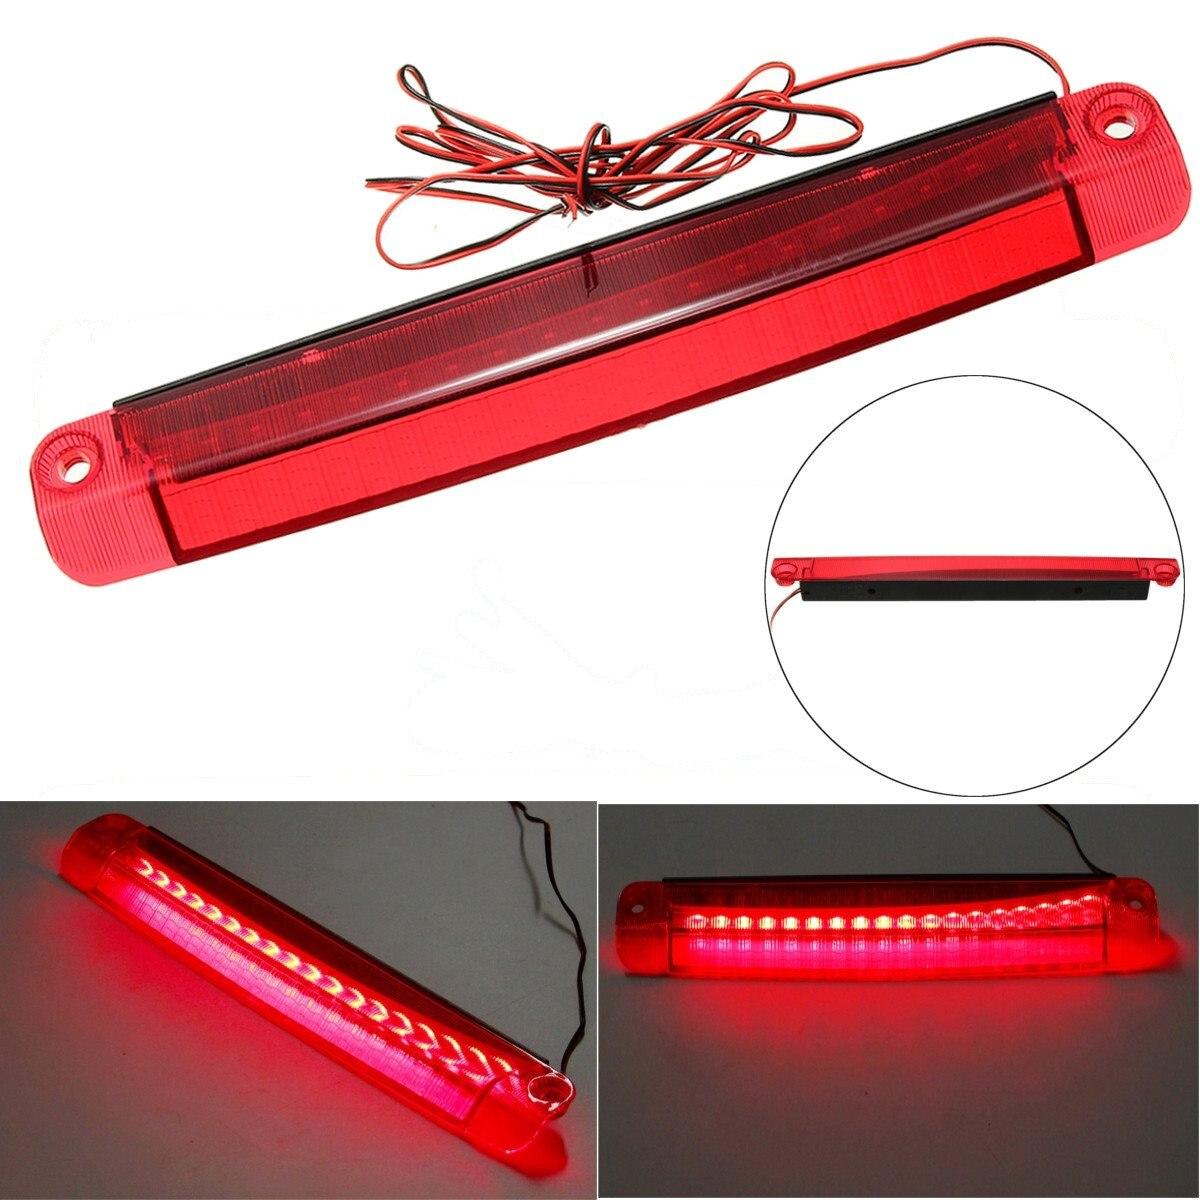 Unverisal Car 18 LED Car Reversing Lights Rear Tail Third Brake Stop Light High Mount Lamp Red 1210 12V 5W